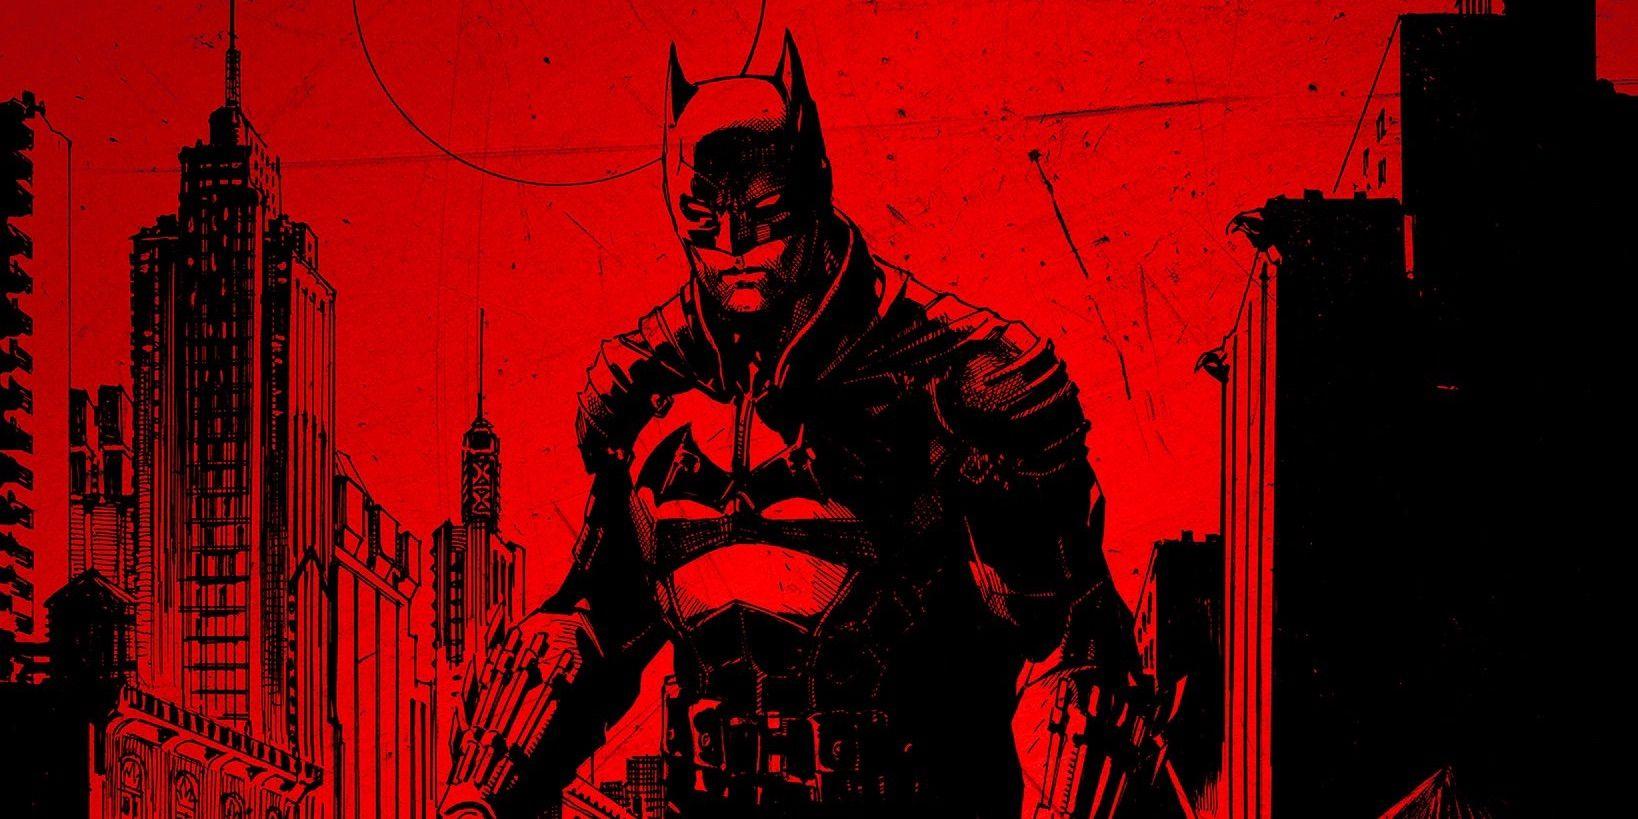 Resultado de imagem para robert pattinson batman comic